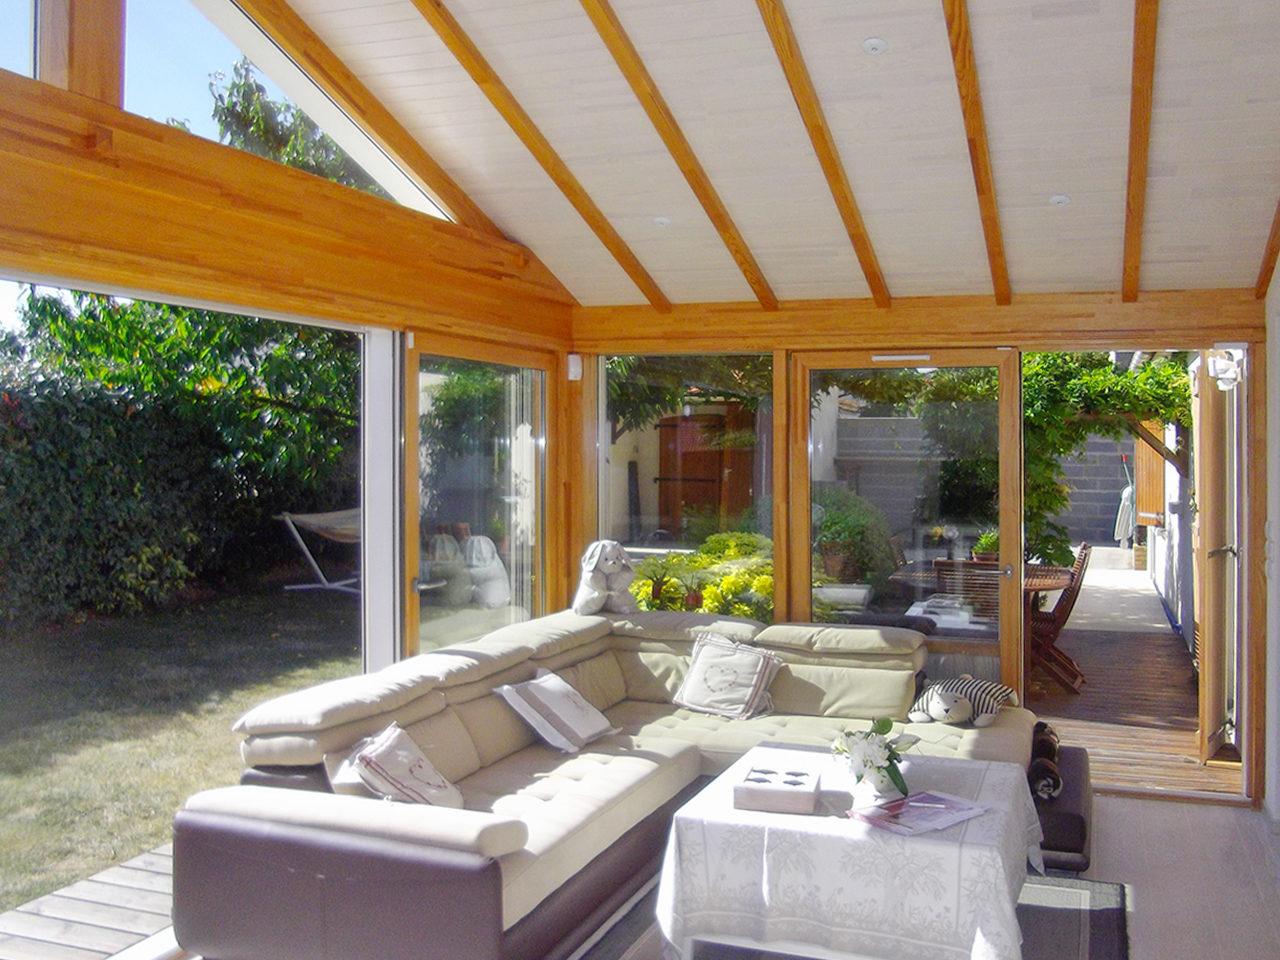 salon chaleureux avec ch ssis fixe vitr padiou v randa. Black Bedroom Furniture Sets. Home Design Ideas